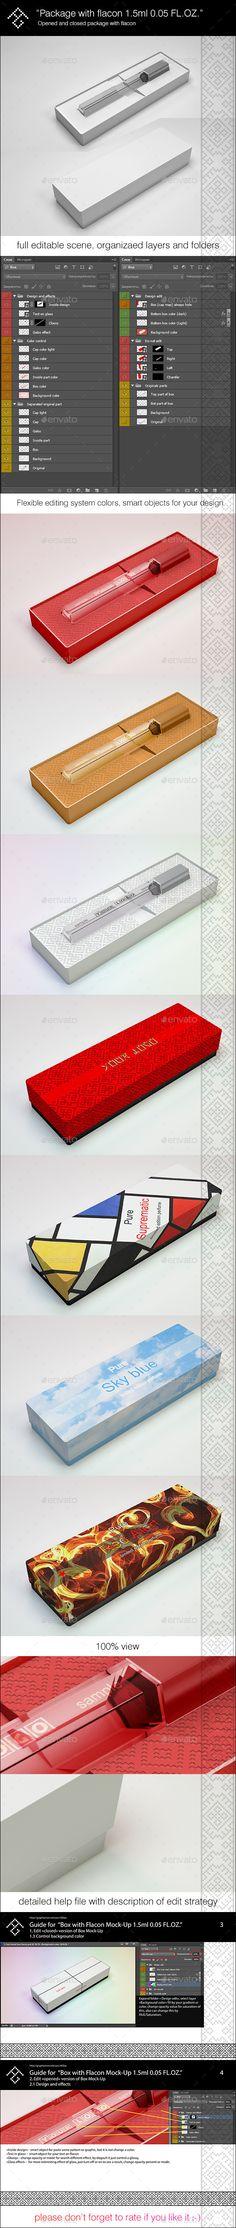 Box with Flacon Mock-Up 1.5ml 0.05 FL.OZ. #design Download: http://graphicriver.net/item/box-with-flacon-mockup-15ml-005-floz/11558408?ref=ksioks